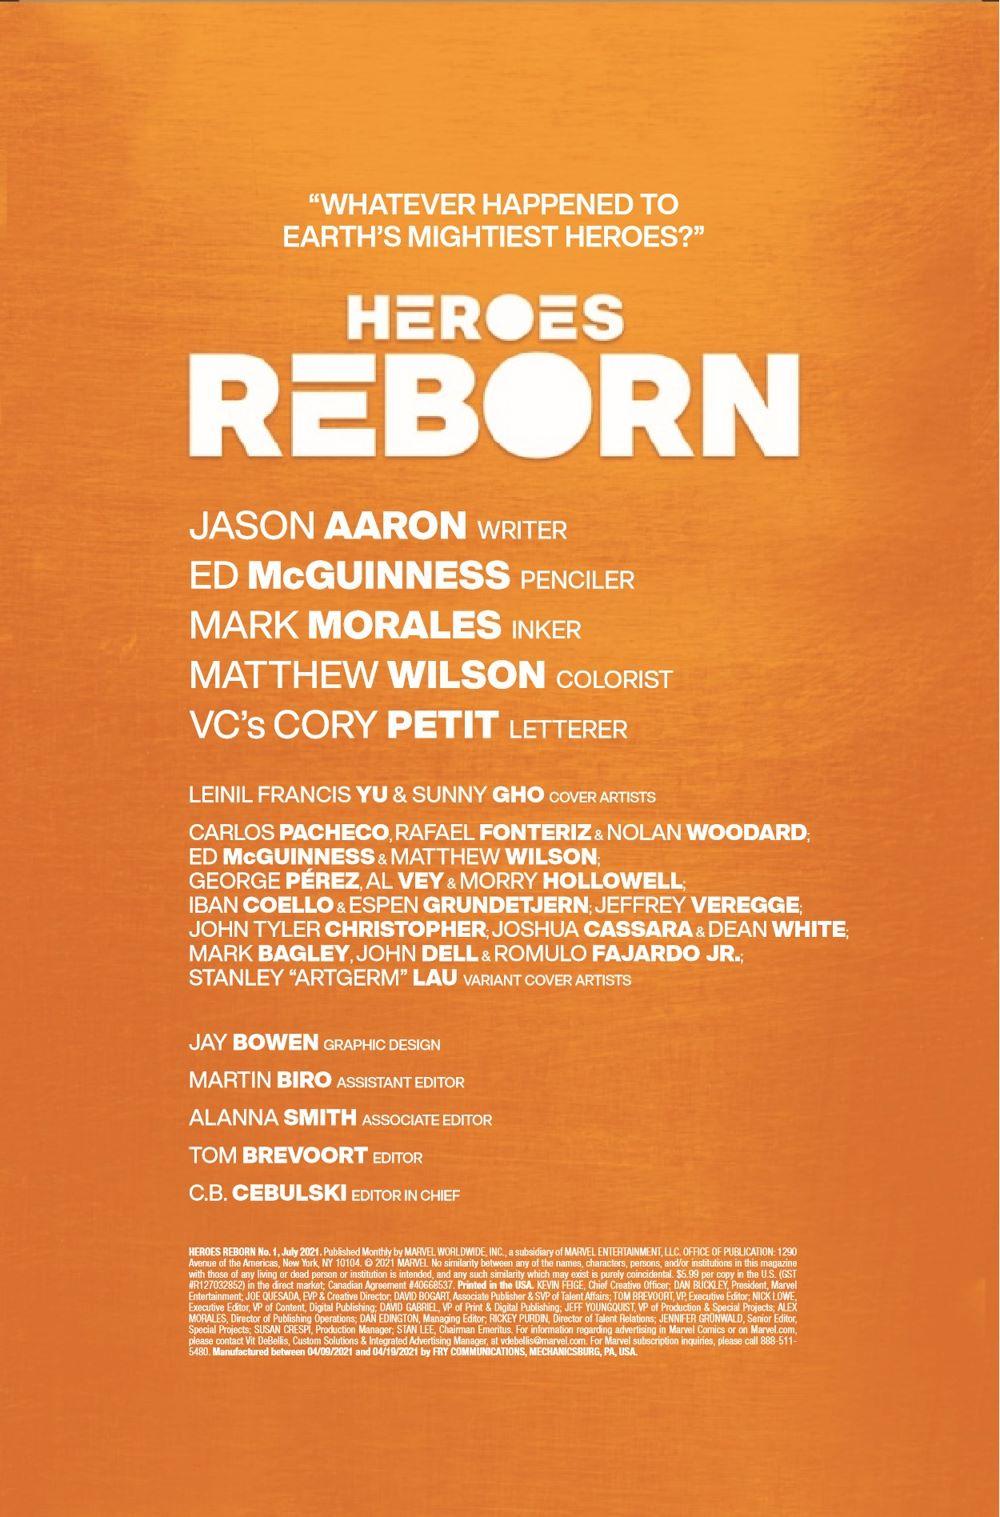 HEROESREBORN2021001_Preview-2 ComicList Previews: HEROES REBORN #1 (OF 7)